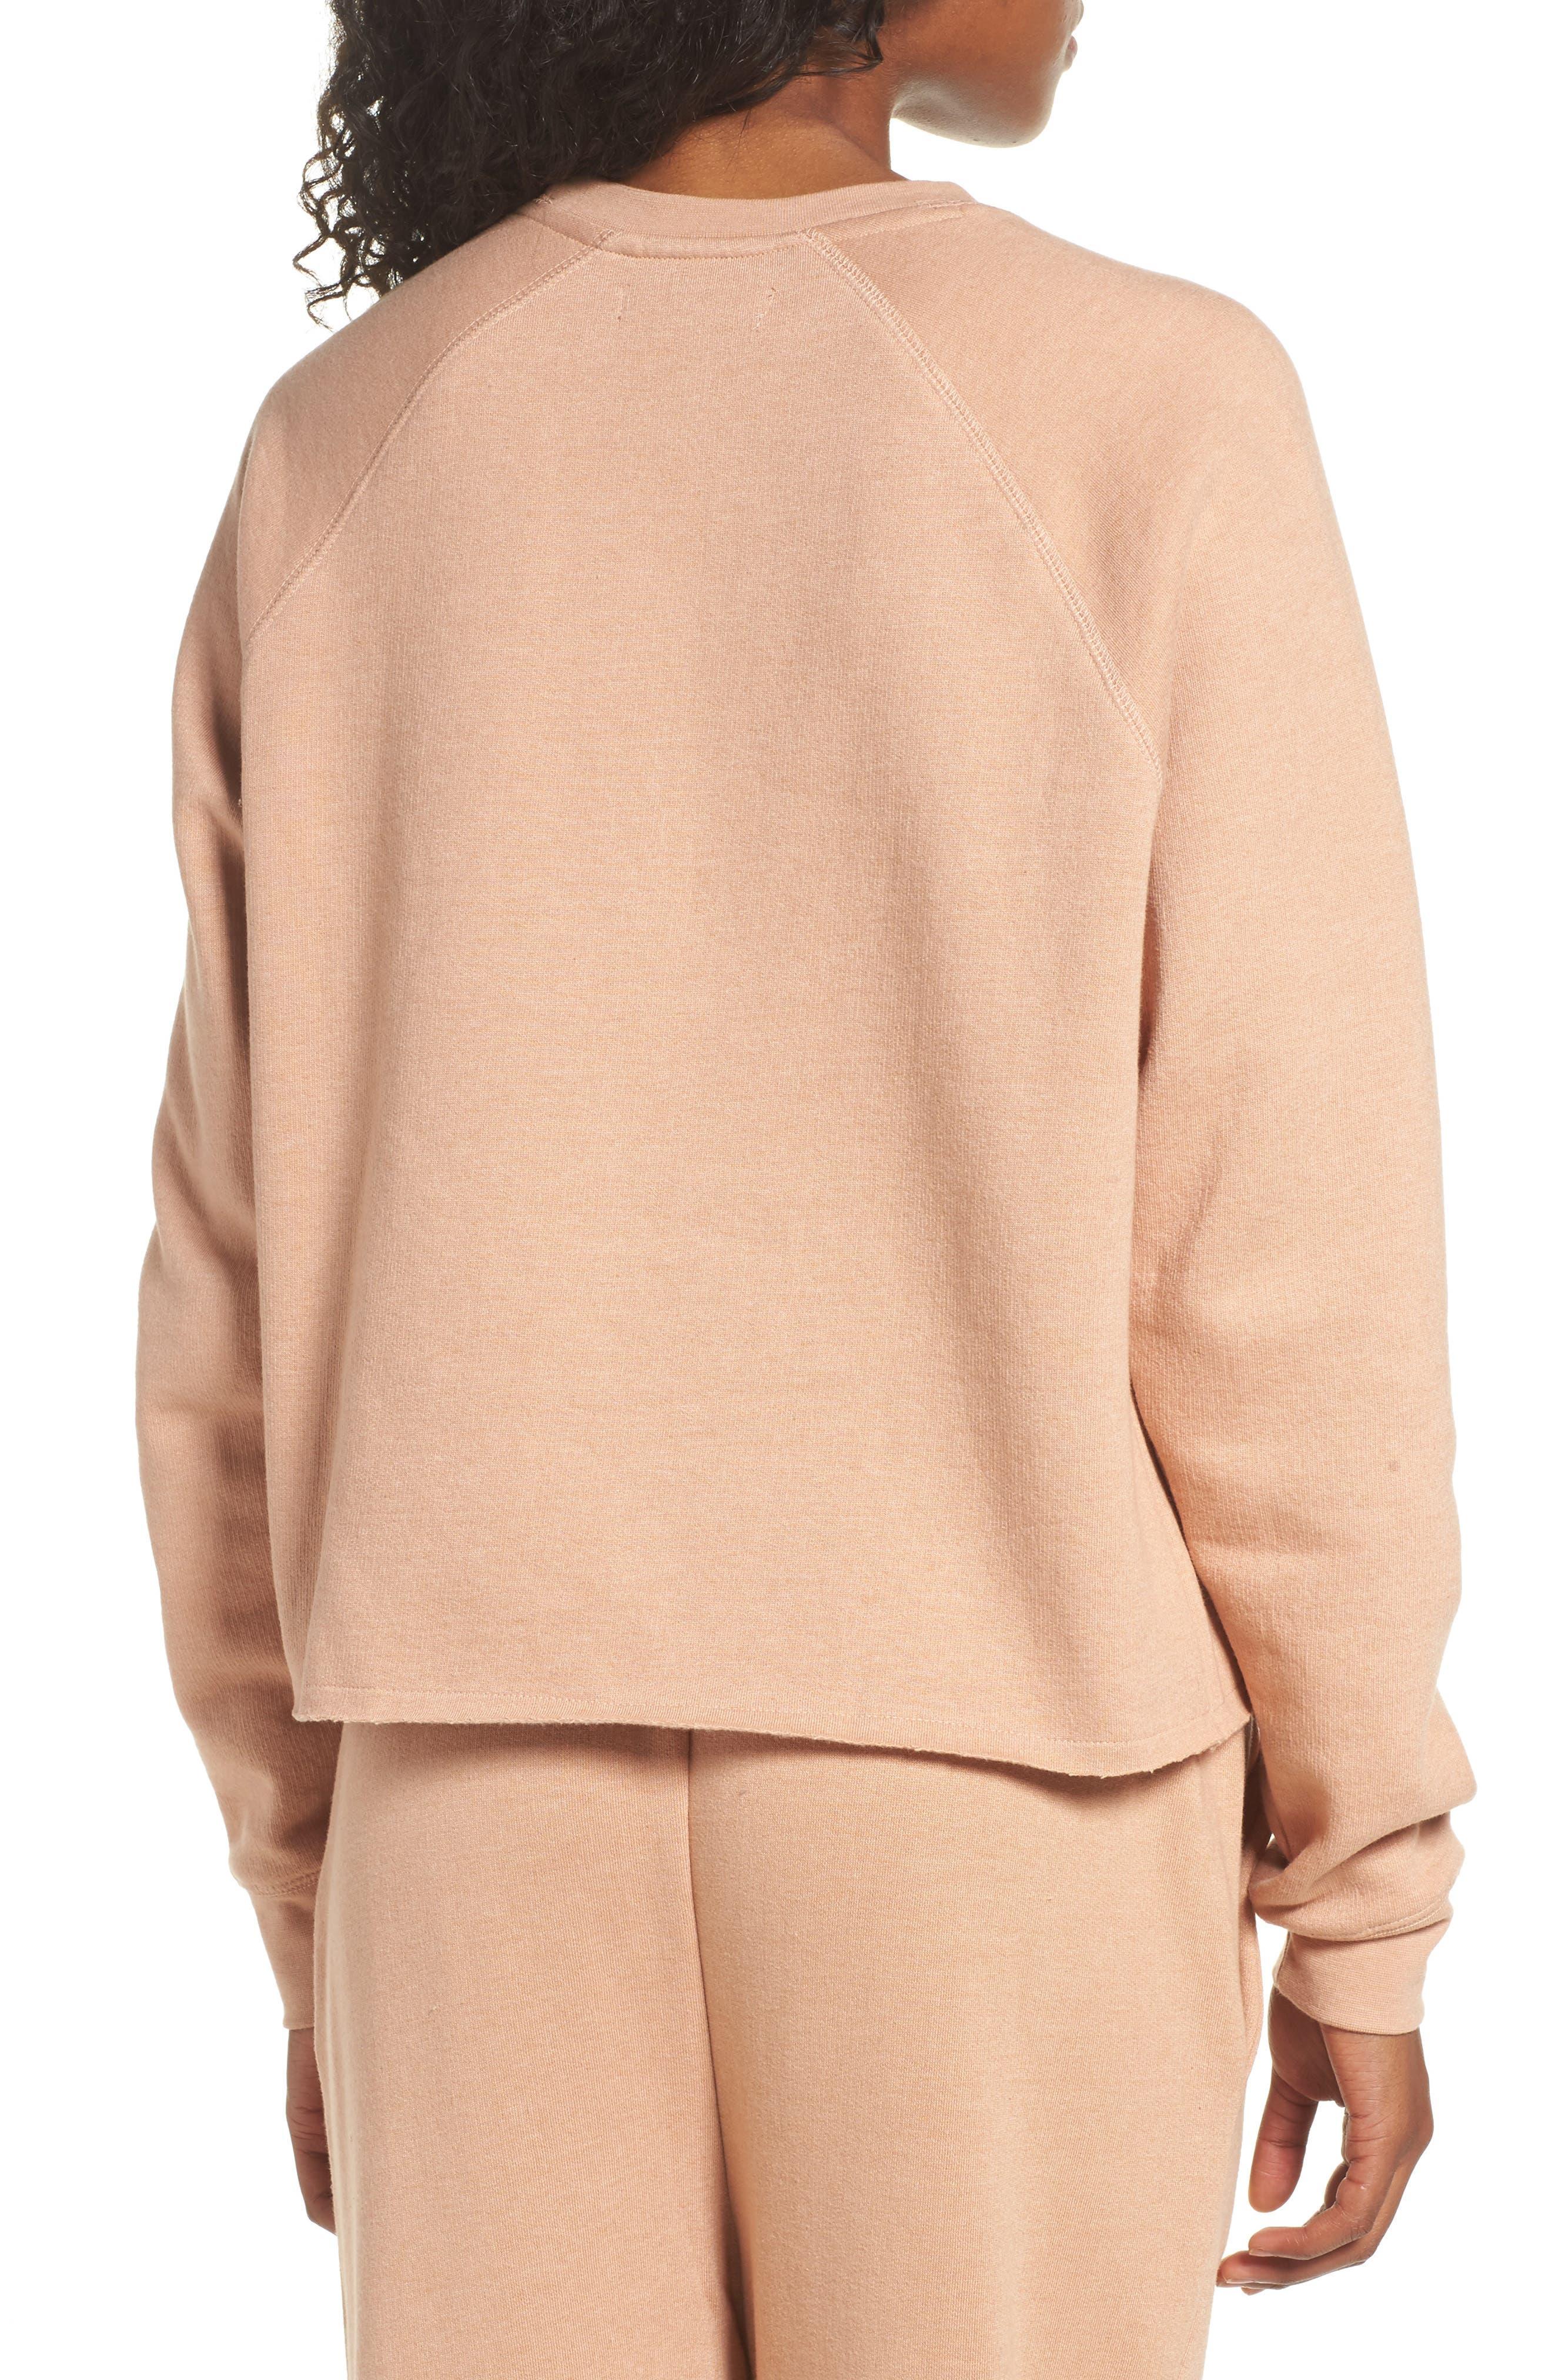 Middle Sister Brunette Sweatshirt,                             Alternate thumbnail 2, color,                             950